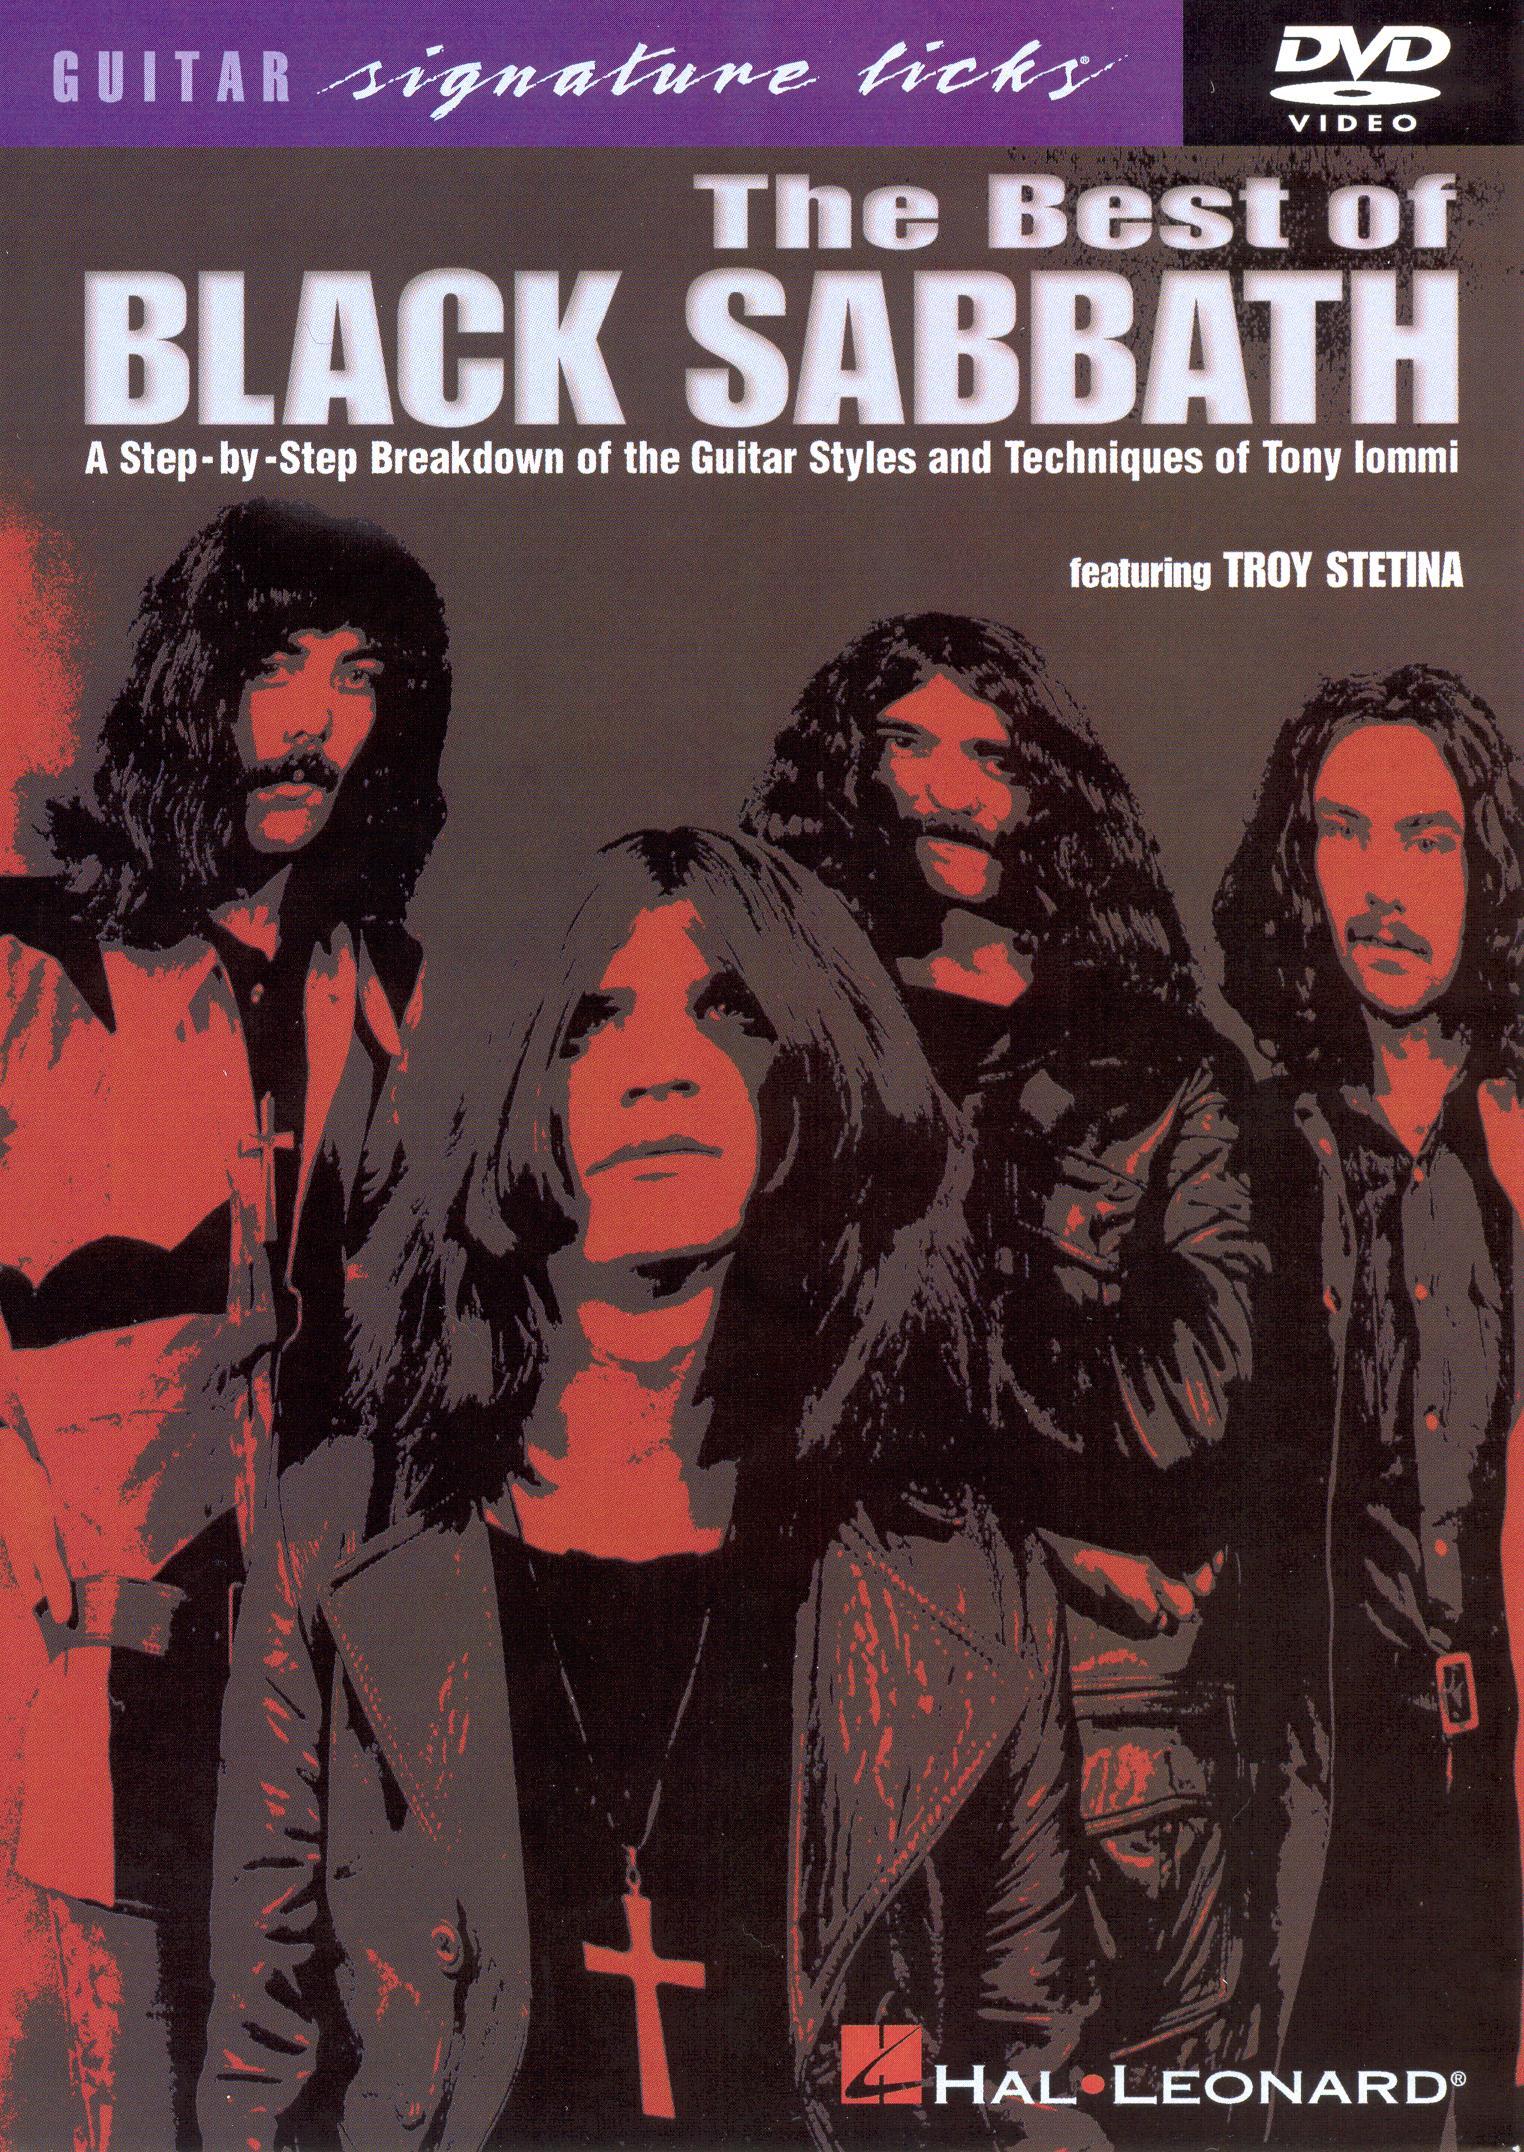 Guitar Signature Licks: The Best of Black Sabbath